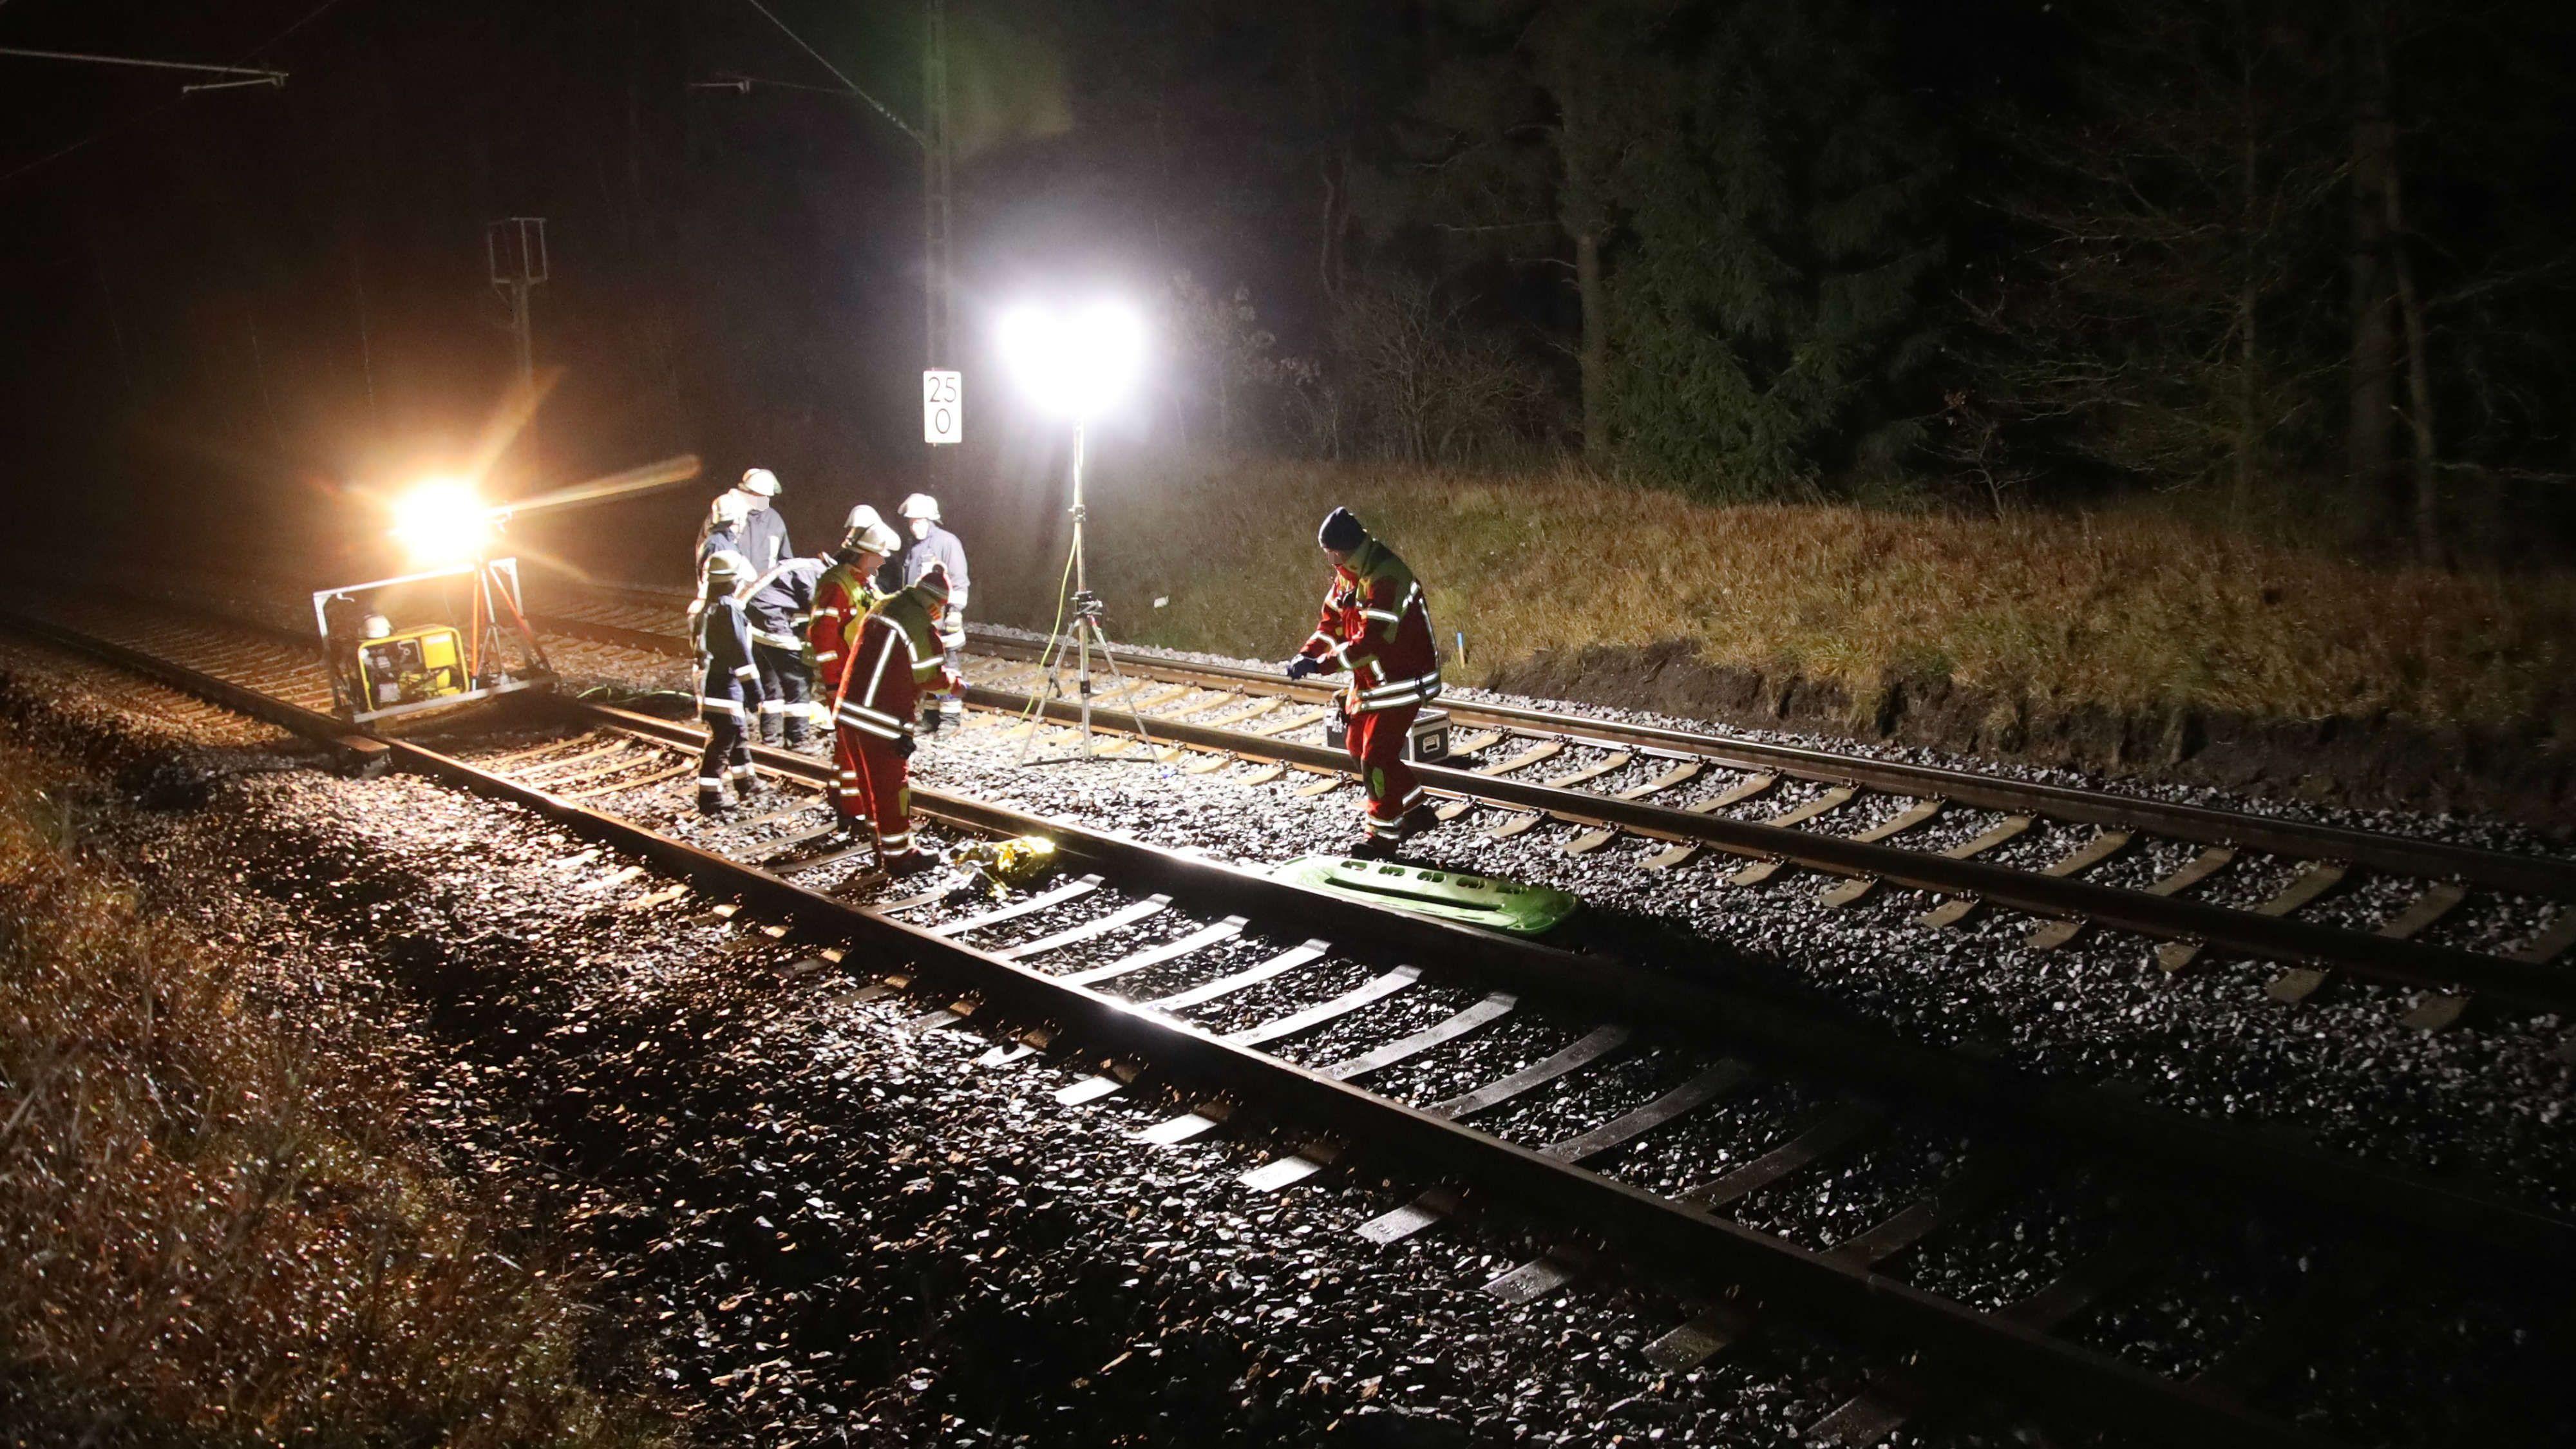 Die Unfallstelle an der Bahnstrecke Regensburg-Nürnberg